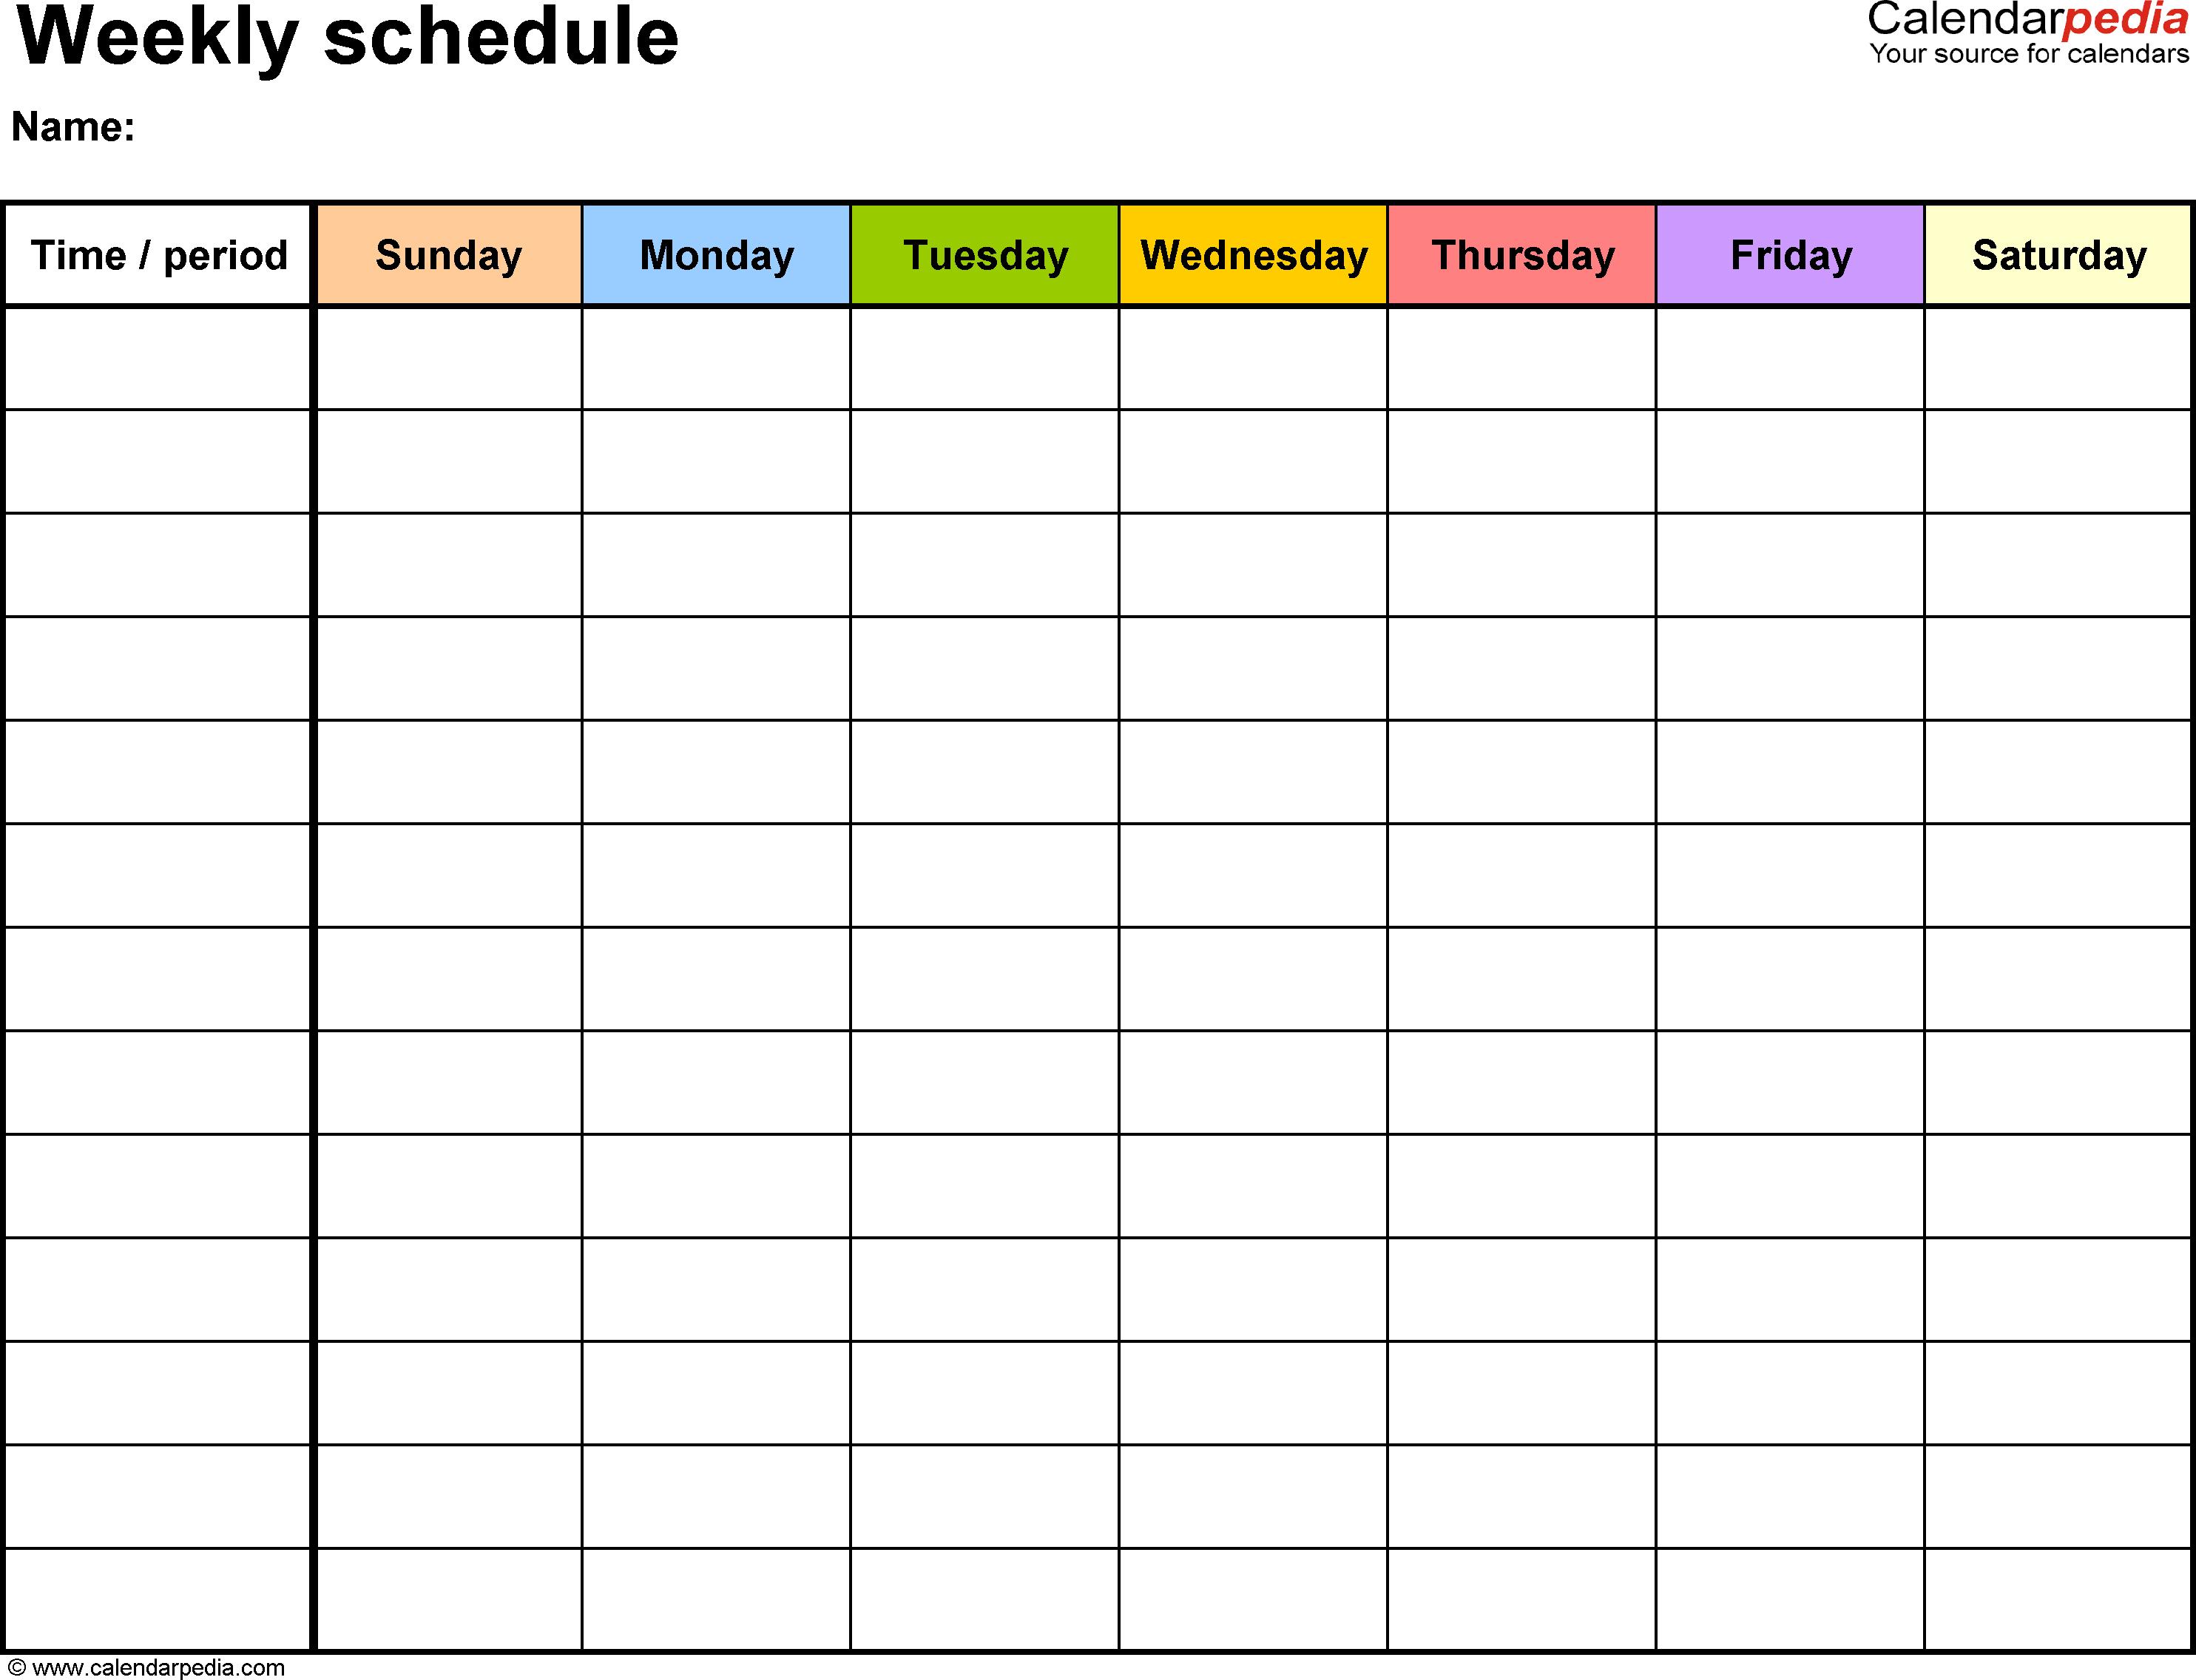 Weekly Schedule Template For Word Version 13: Landscape, 1 Sunday Through Saturday Blanl Calendar